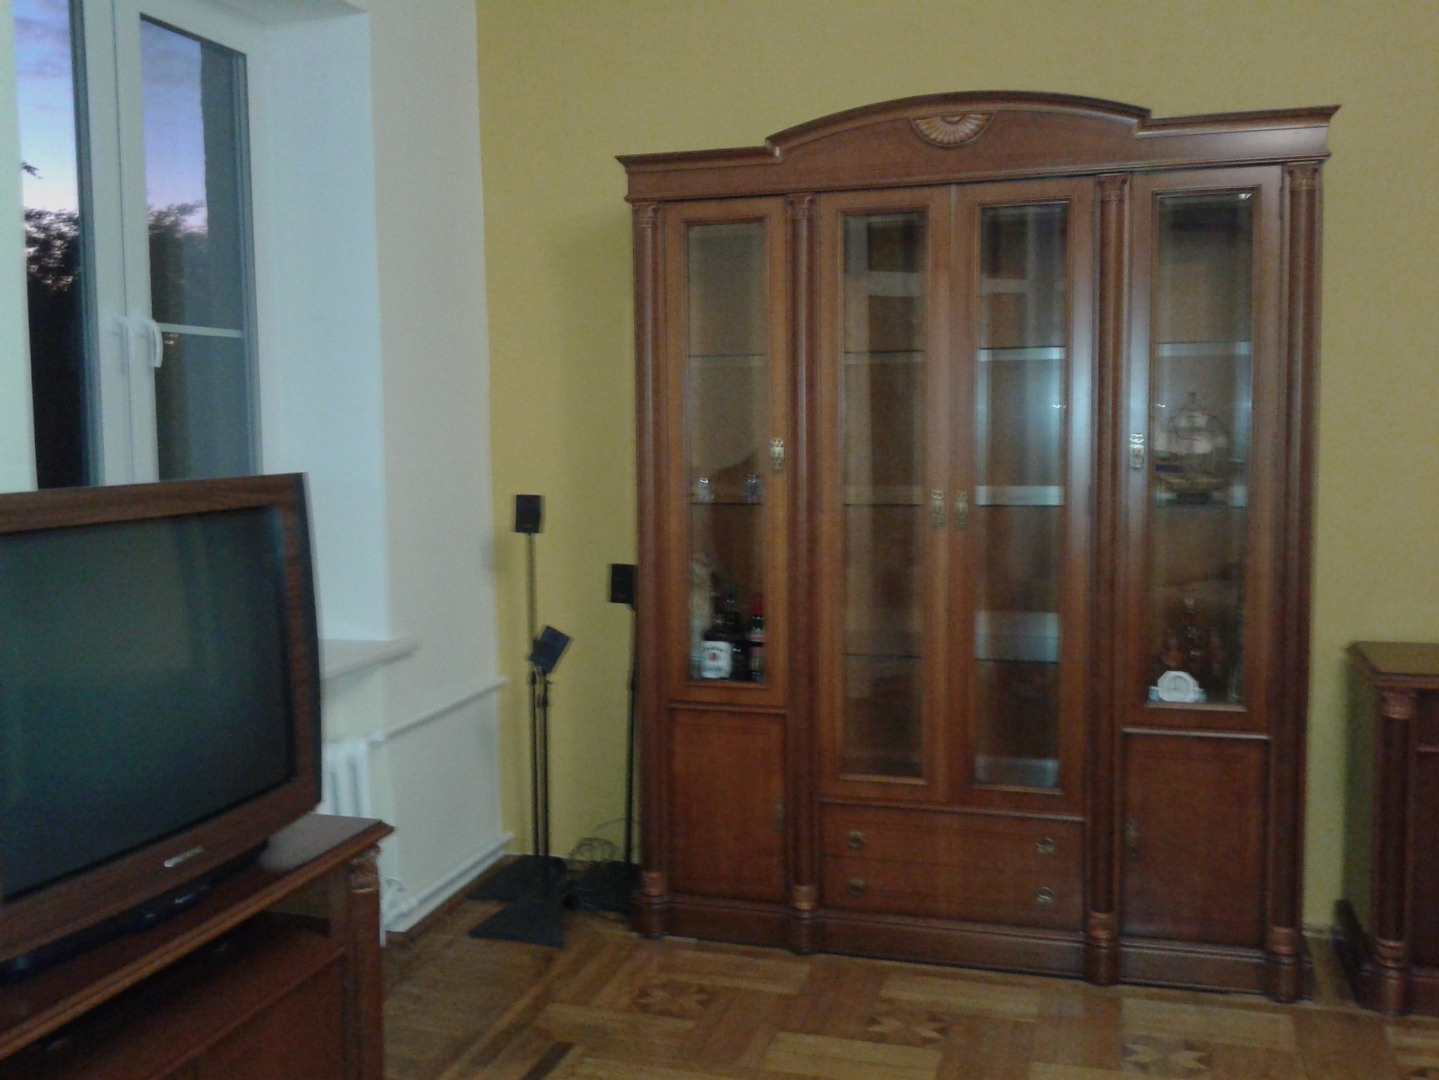 Продается 2-комнатная Квартира на ул. Шевченко Пр. — 90 000 у.е. (фото №12)